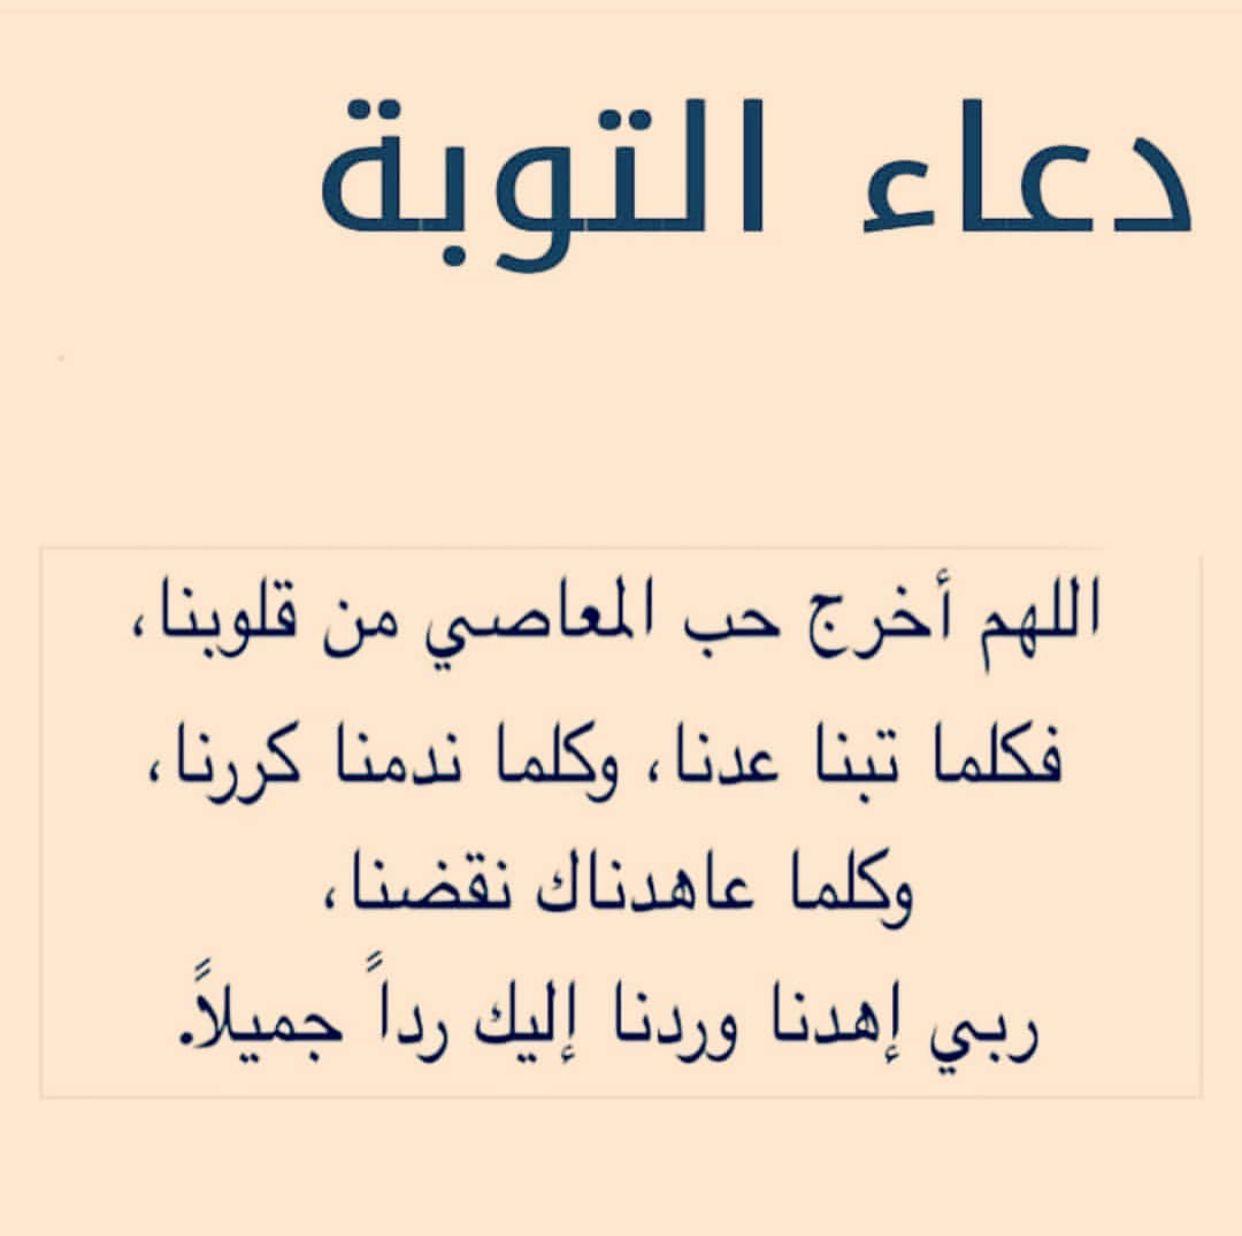 Pin By Hanan Aladwani On دعاء التوبة Math Arabic Calligraphy Calligraphy